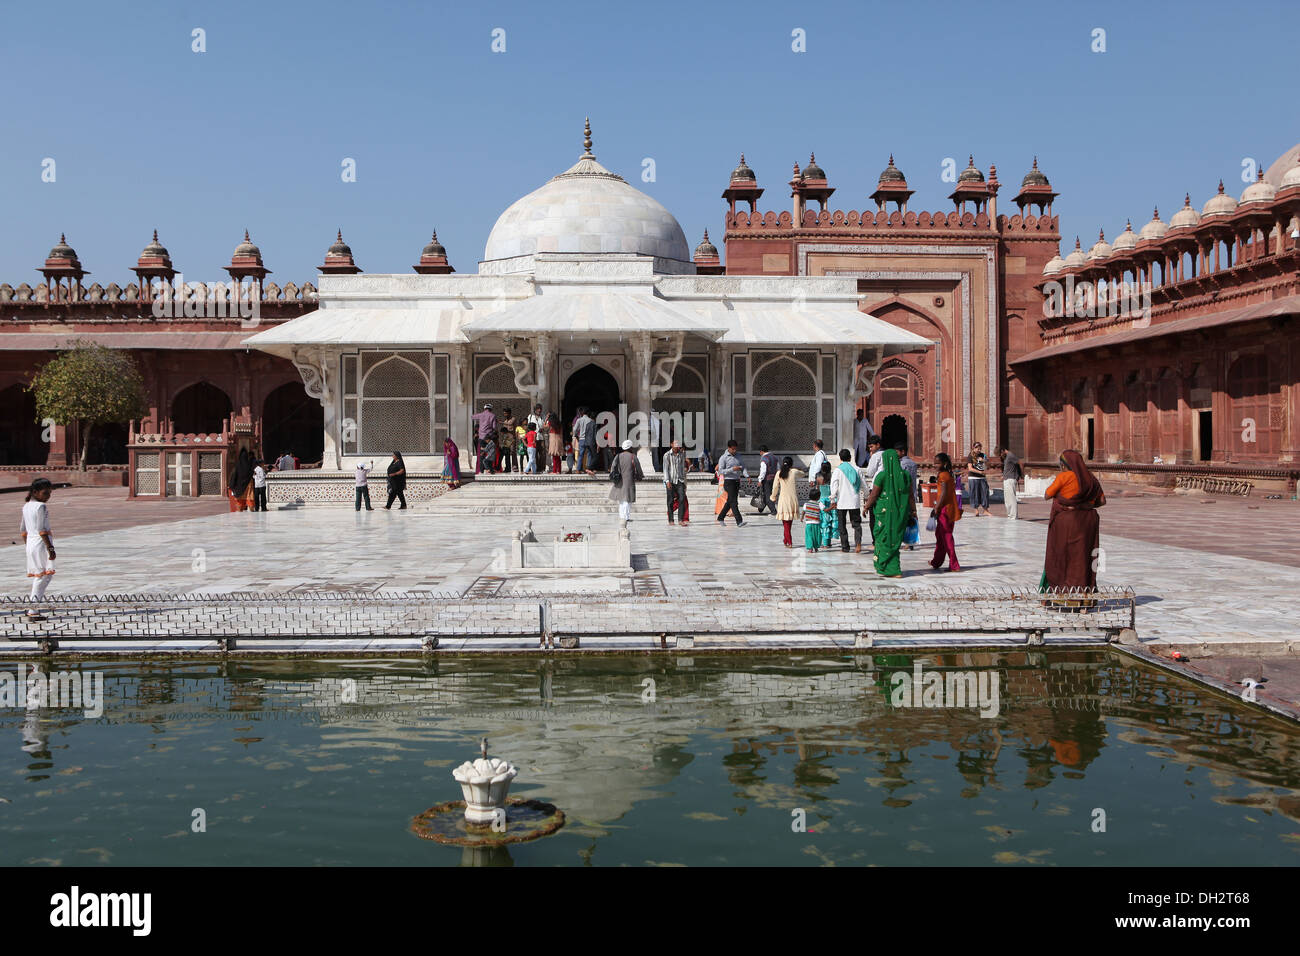 Grave of Shaikh Alauddin Chisti, Jama Masjid Mosque,Fatehpur Sikri, Uttar Pradesh, India, - Stock Image